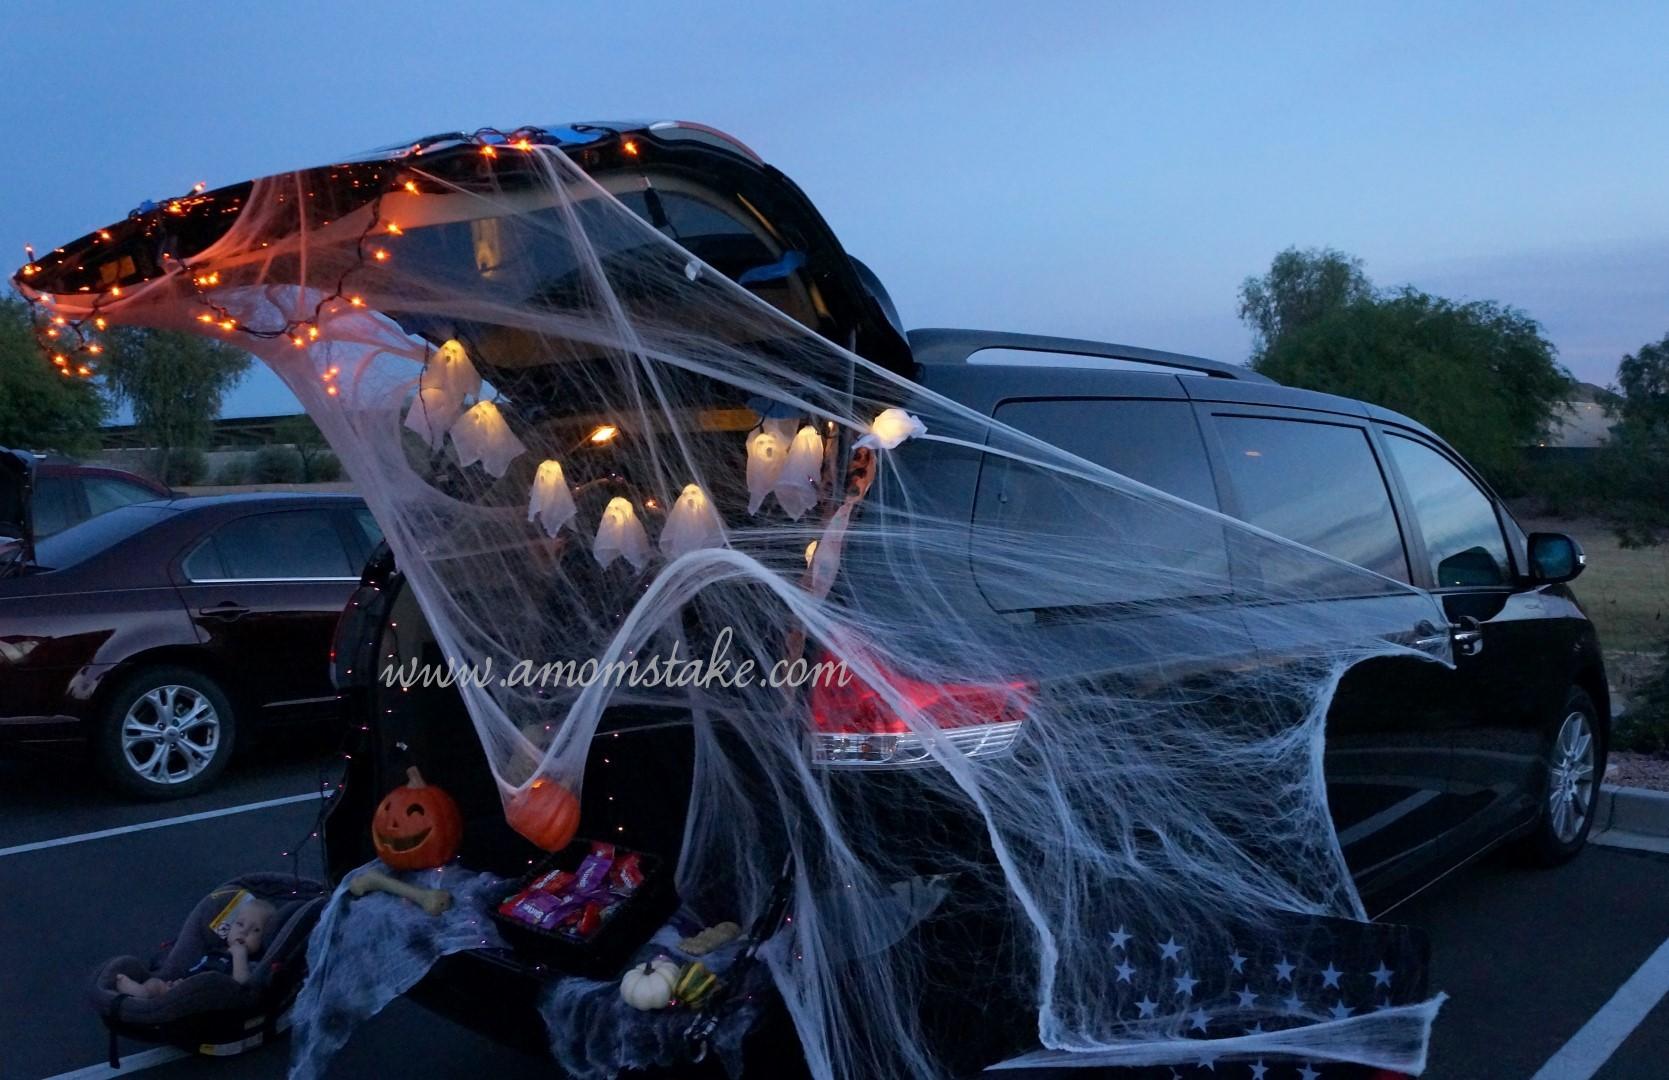 Toyota Sienna Halloween #SiennaDiaries